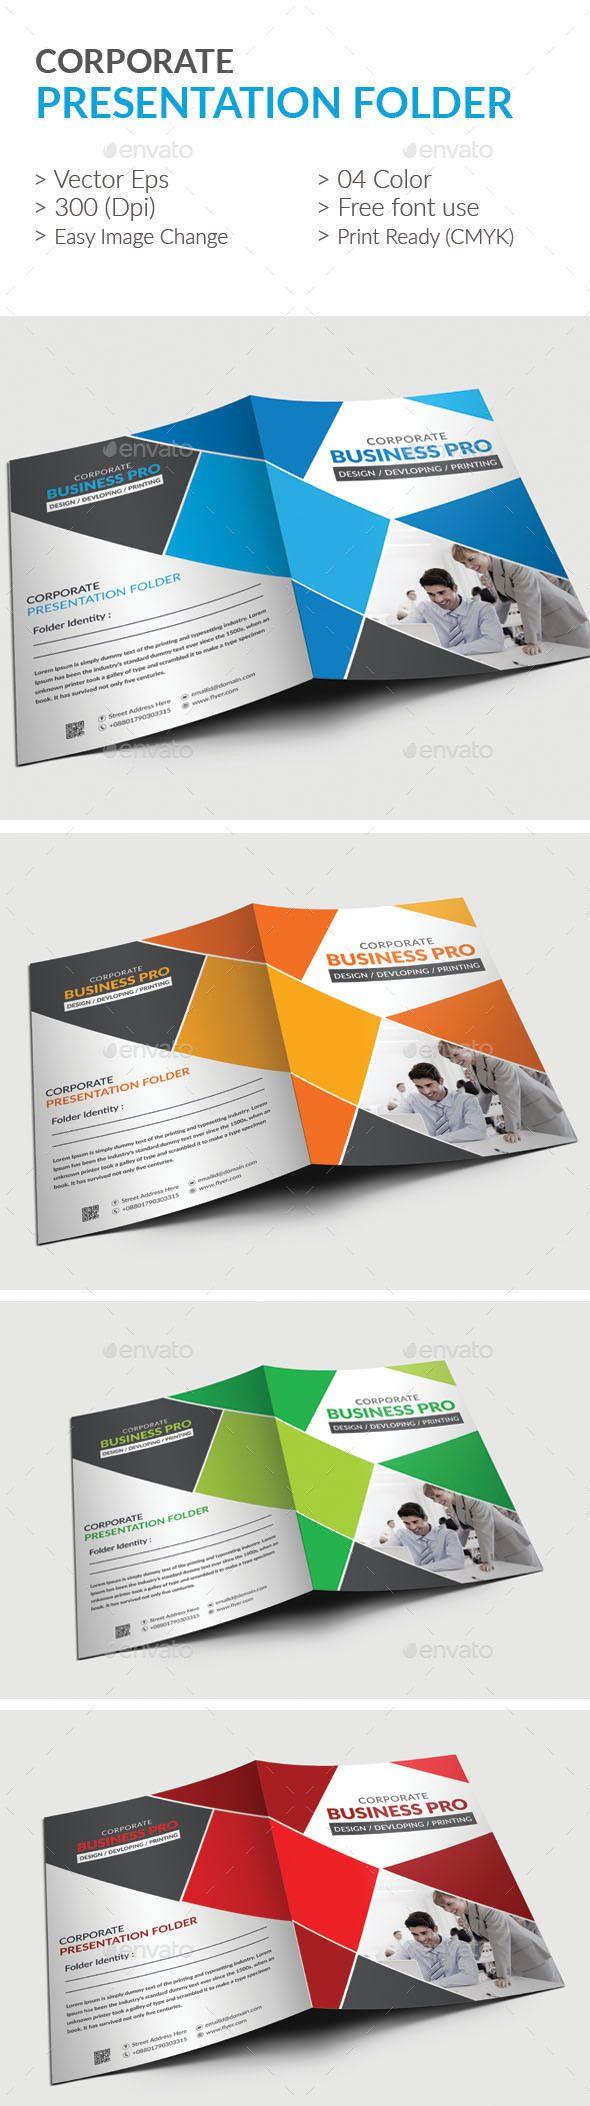 Presentation folder | Presentation folder, Template and Ai illustrator